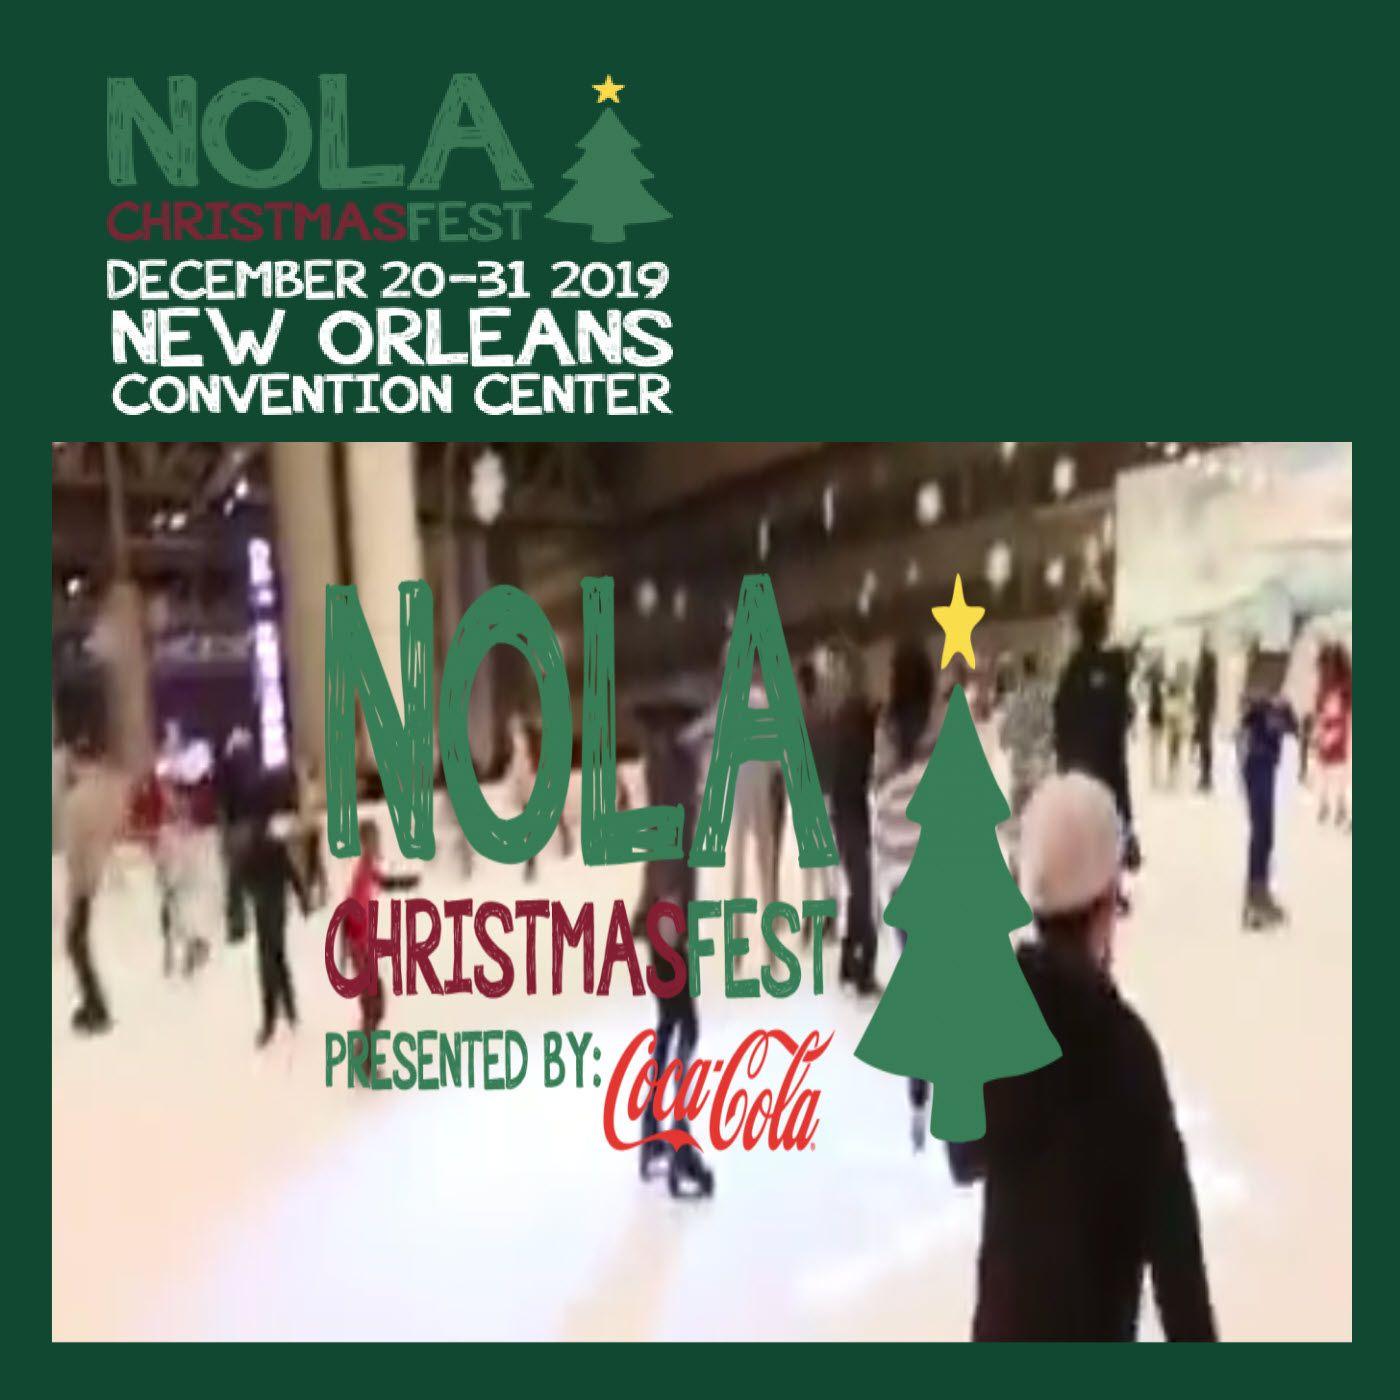 Countyfairgrounds presents the Nola Christmas Fest